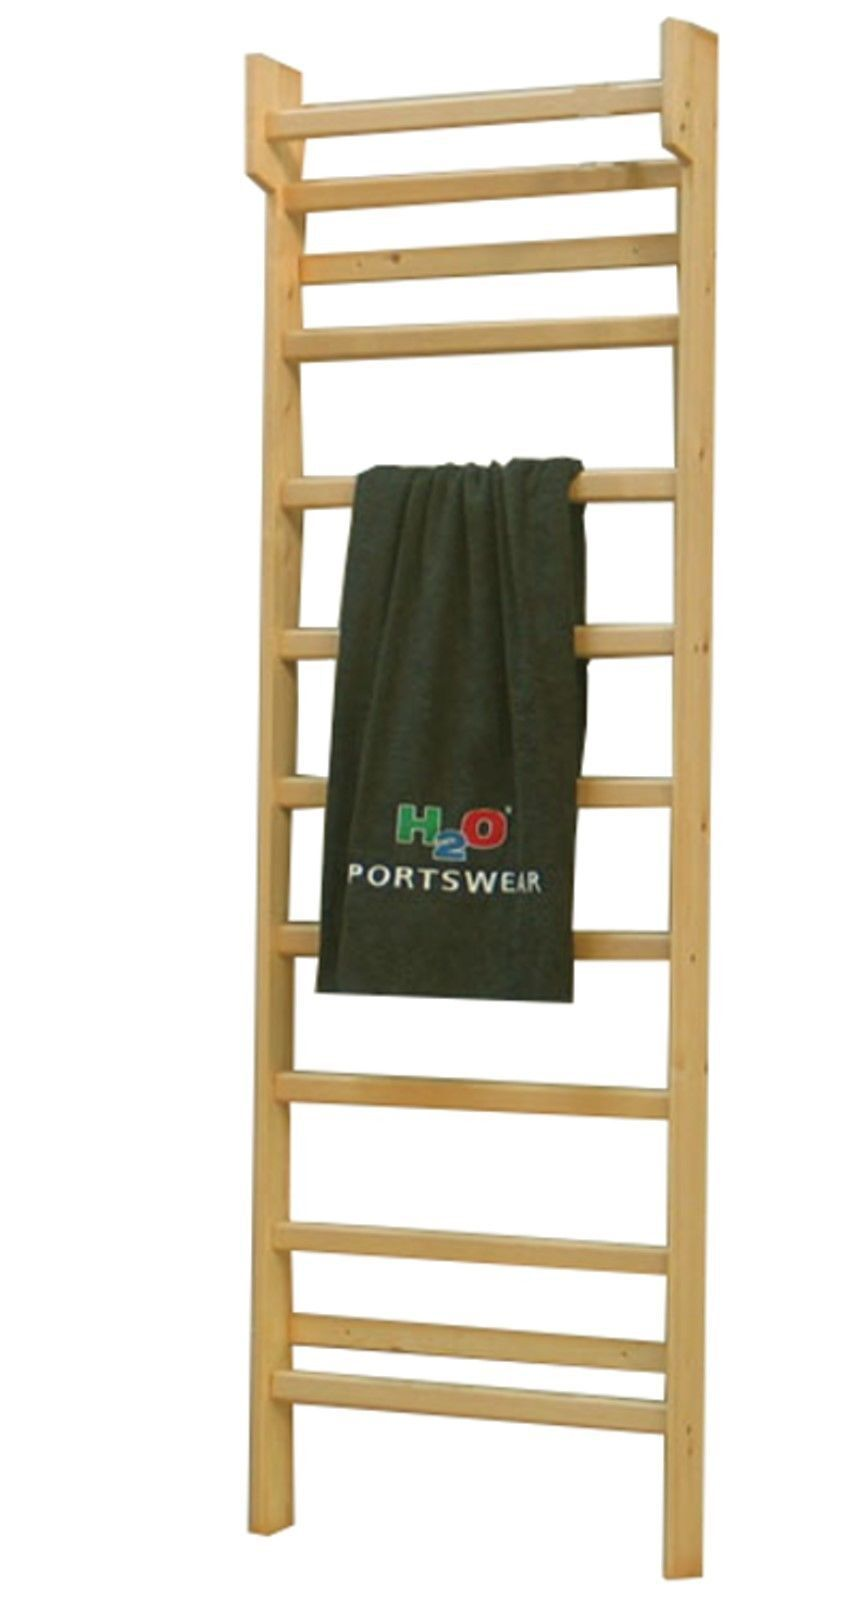 Solide Holz Sprossenwand Turnwand Kletterwand Gymnastik Fitness 225x70 cm